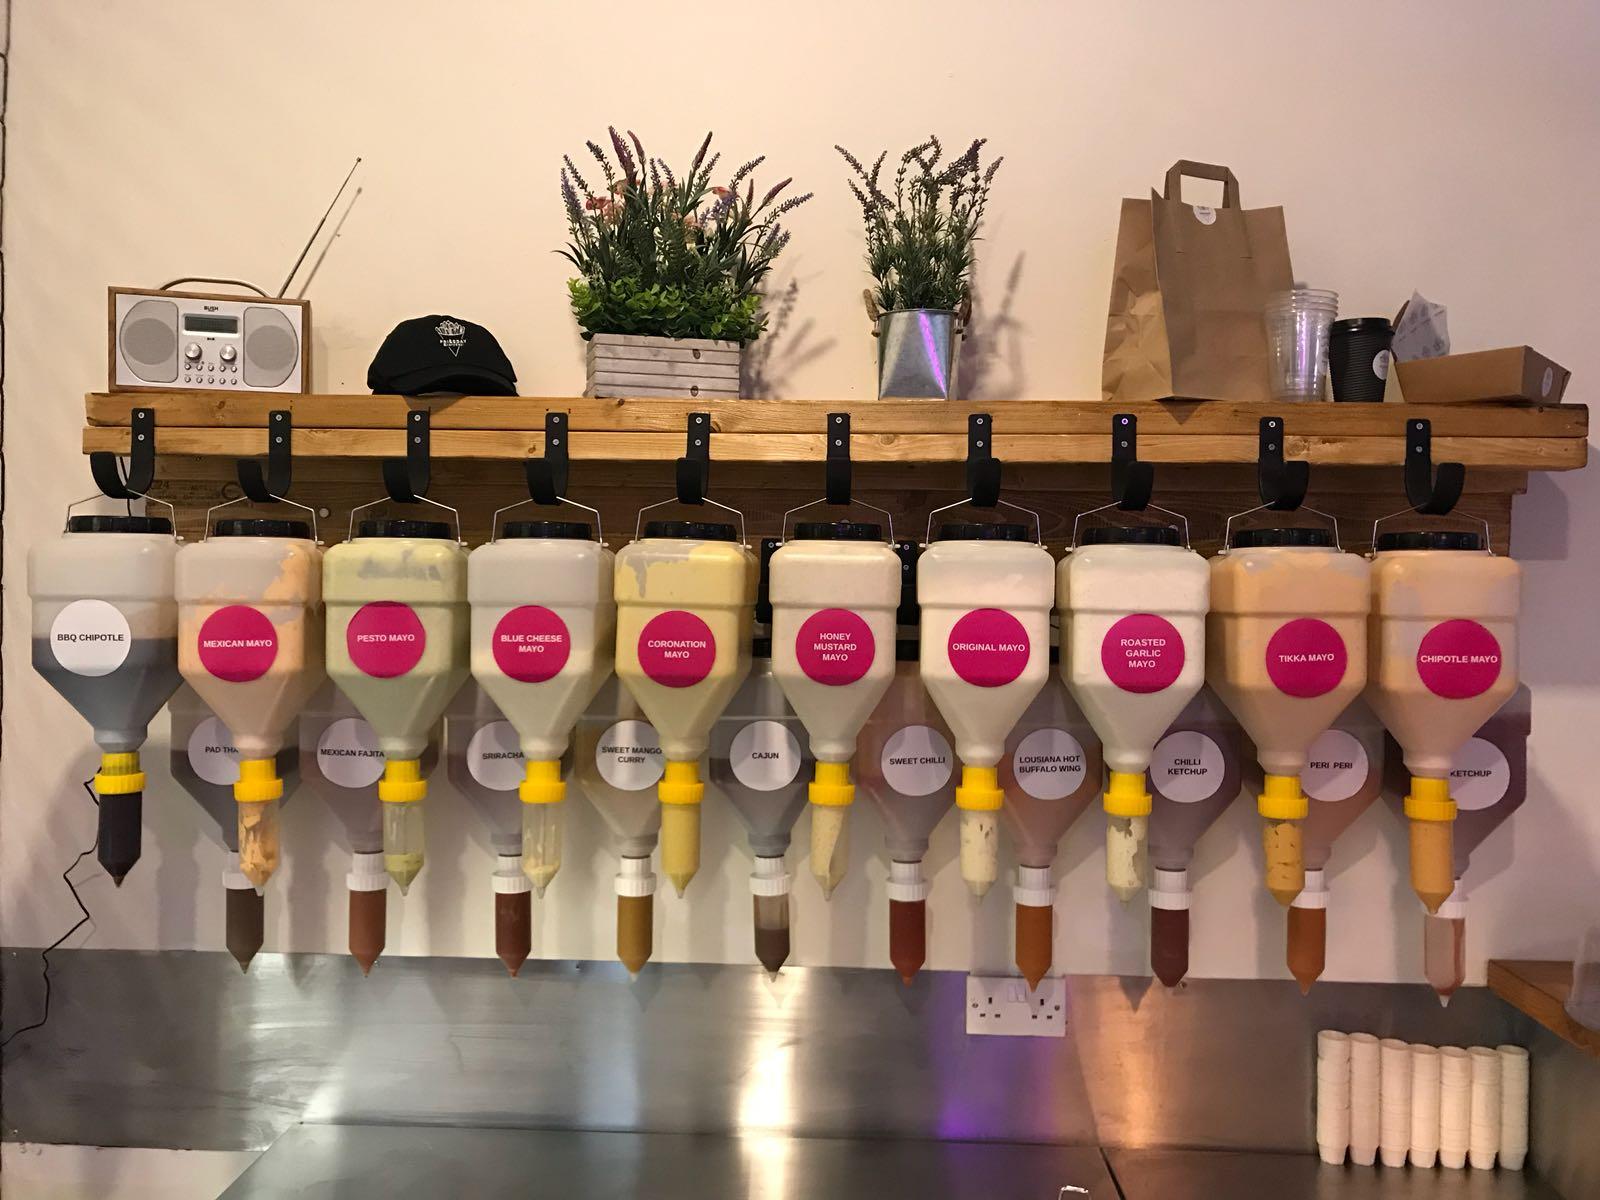 Liquid Dispenser For Sauce Soap And Liquids Hanging